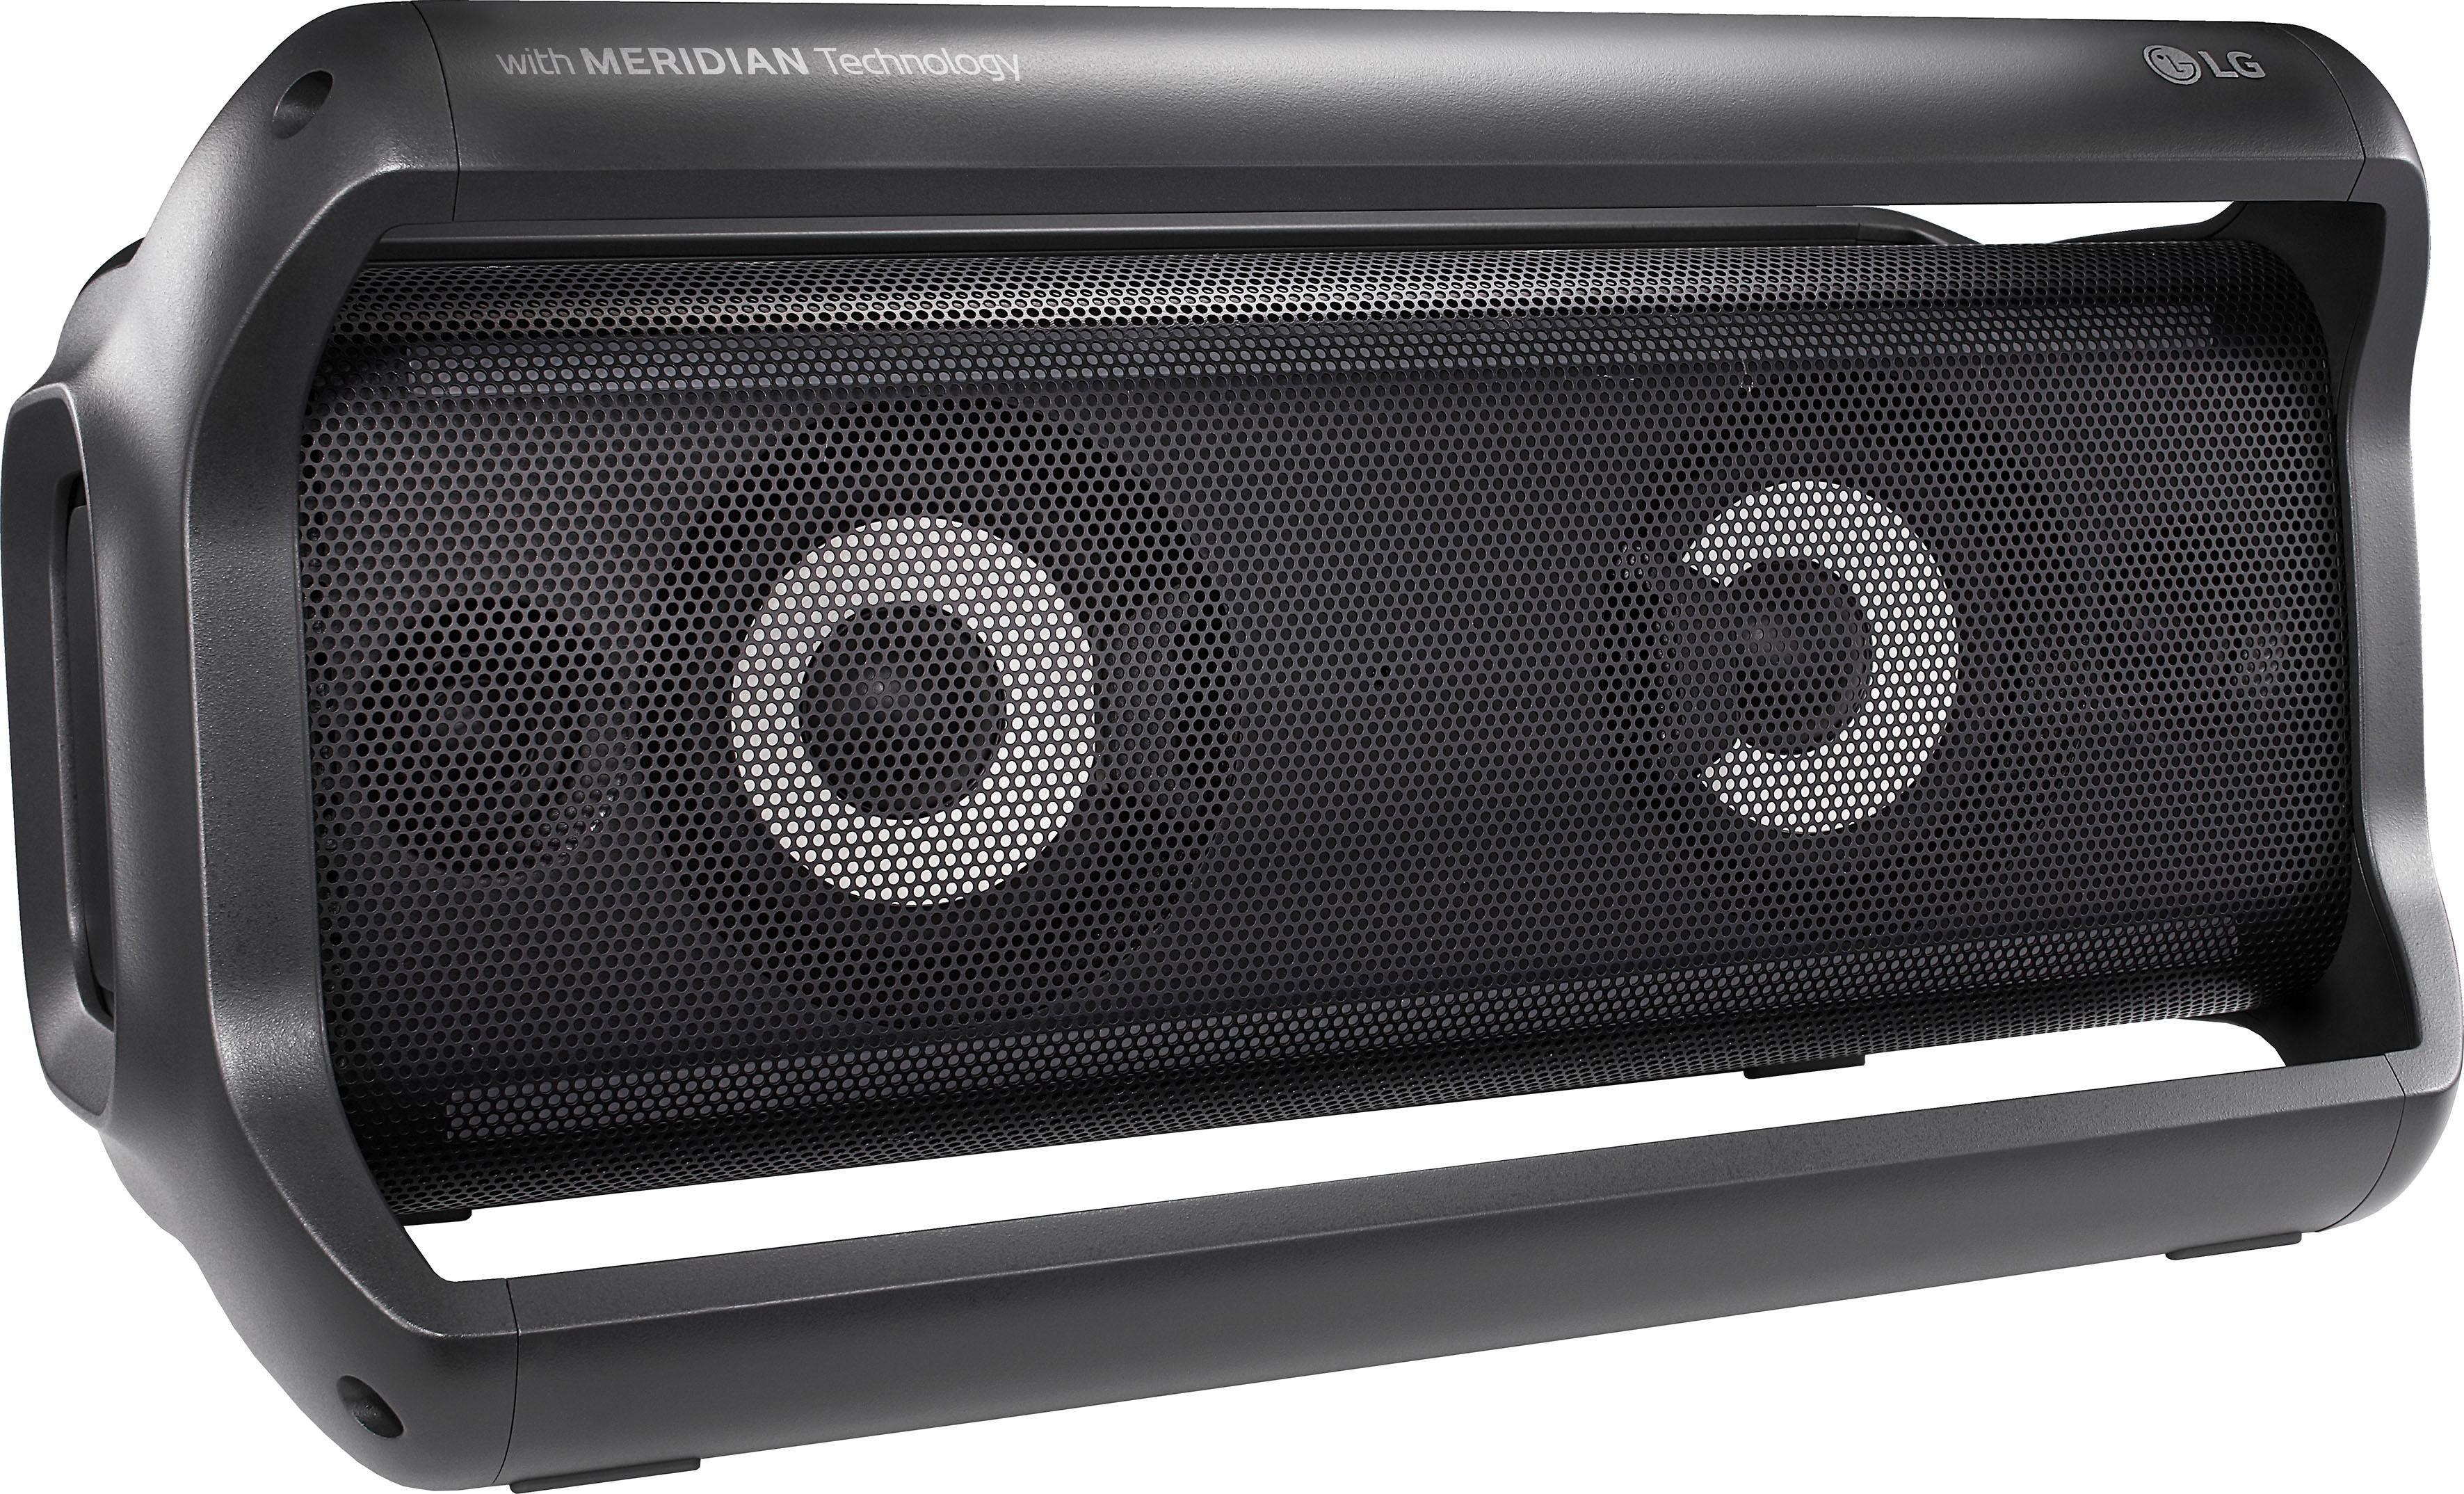 LG PK7 2.0 Bluetooth-Lautsprecher (Bluetooth, Google Assistant, 40 W)